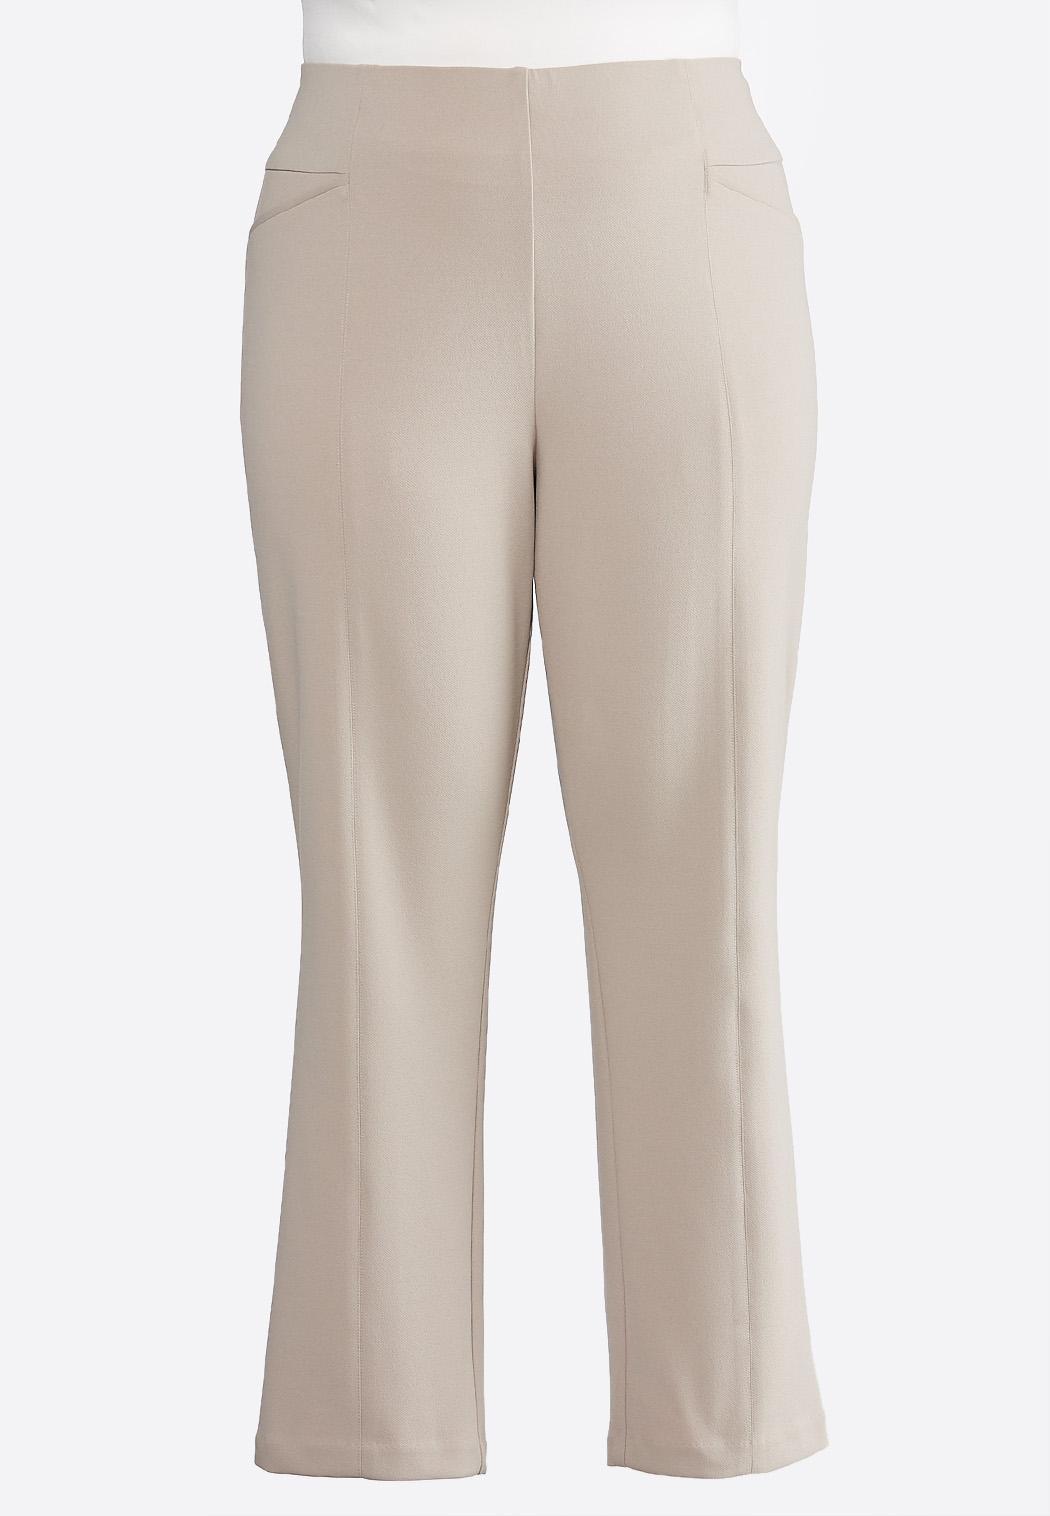 6b18fdcf6f Plus Size Twill Pintuck Pants Pants Cato Fashions